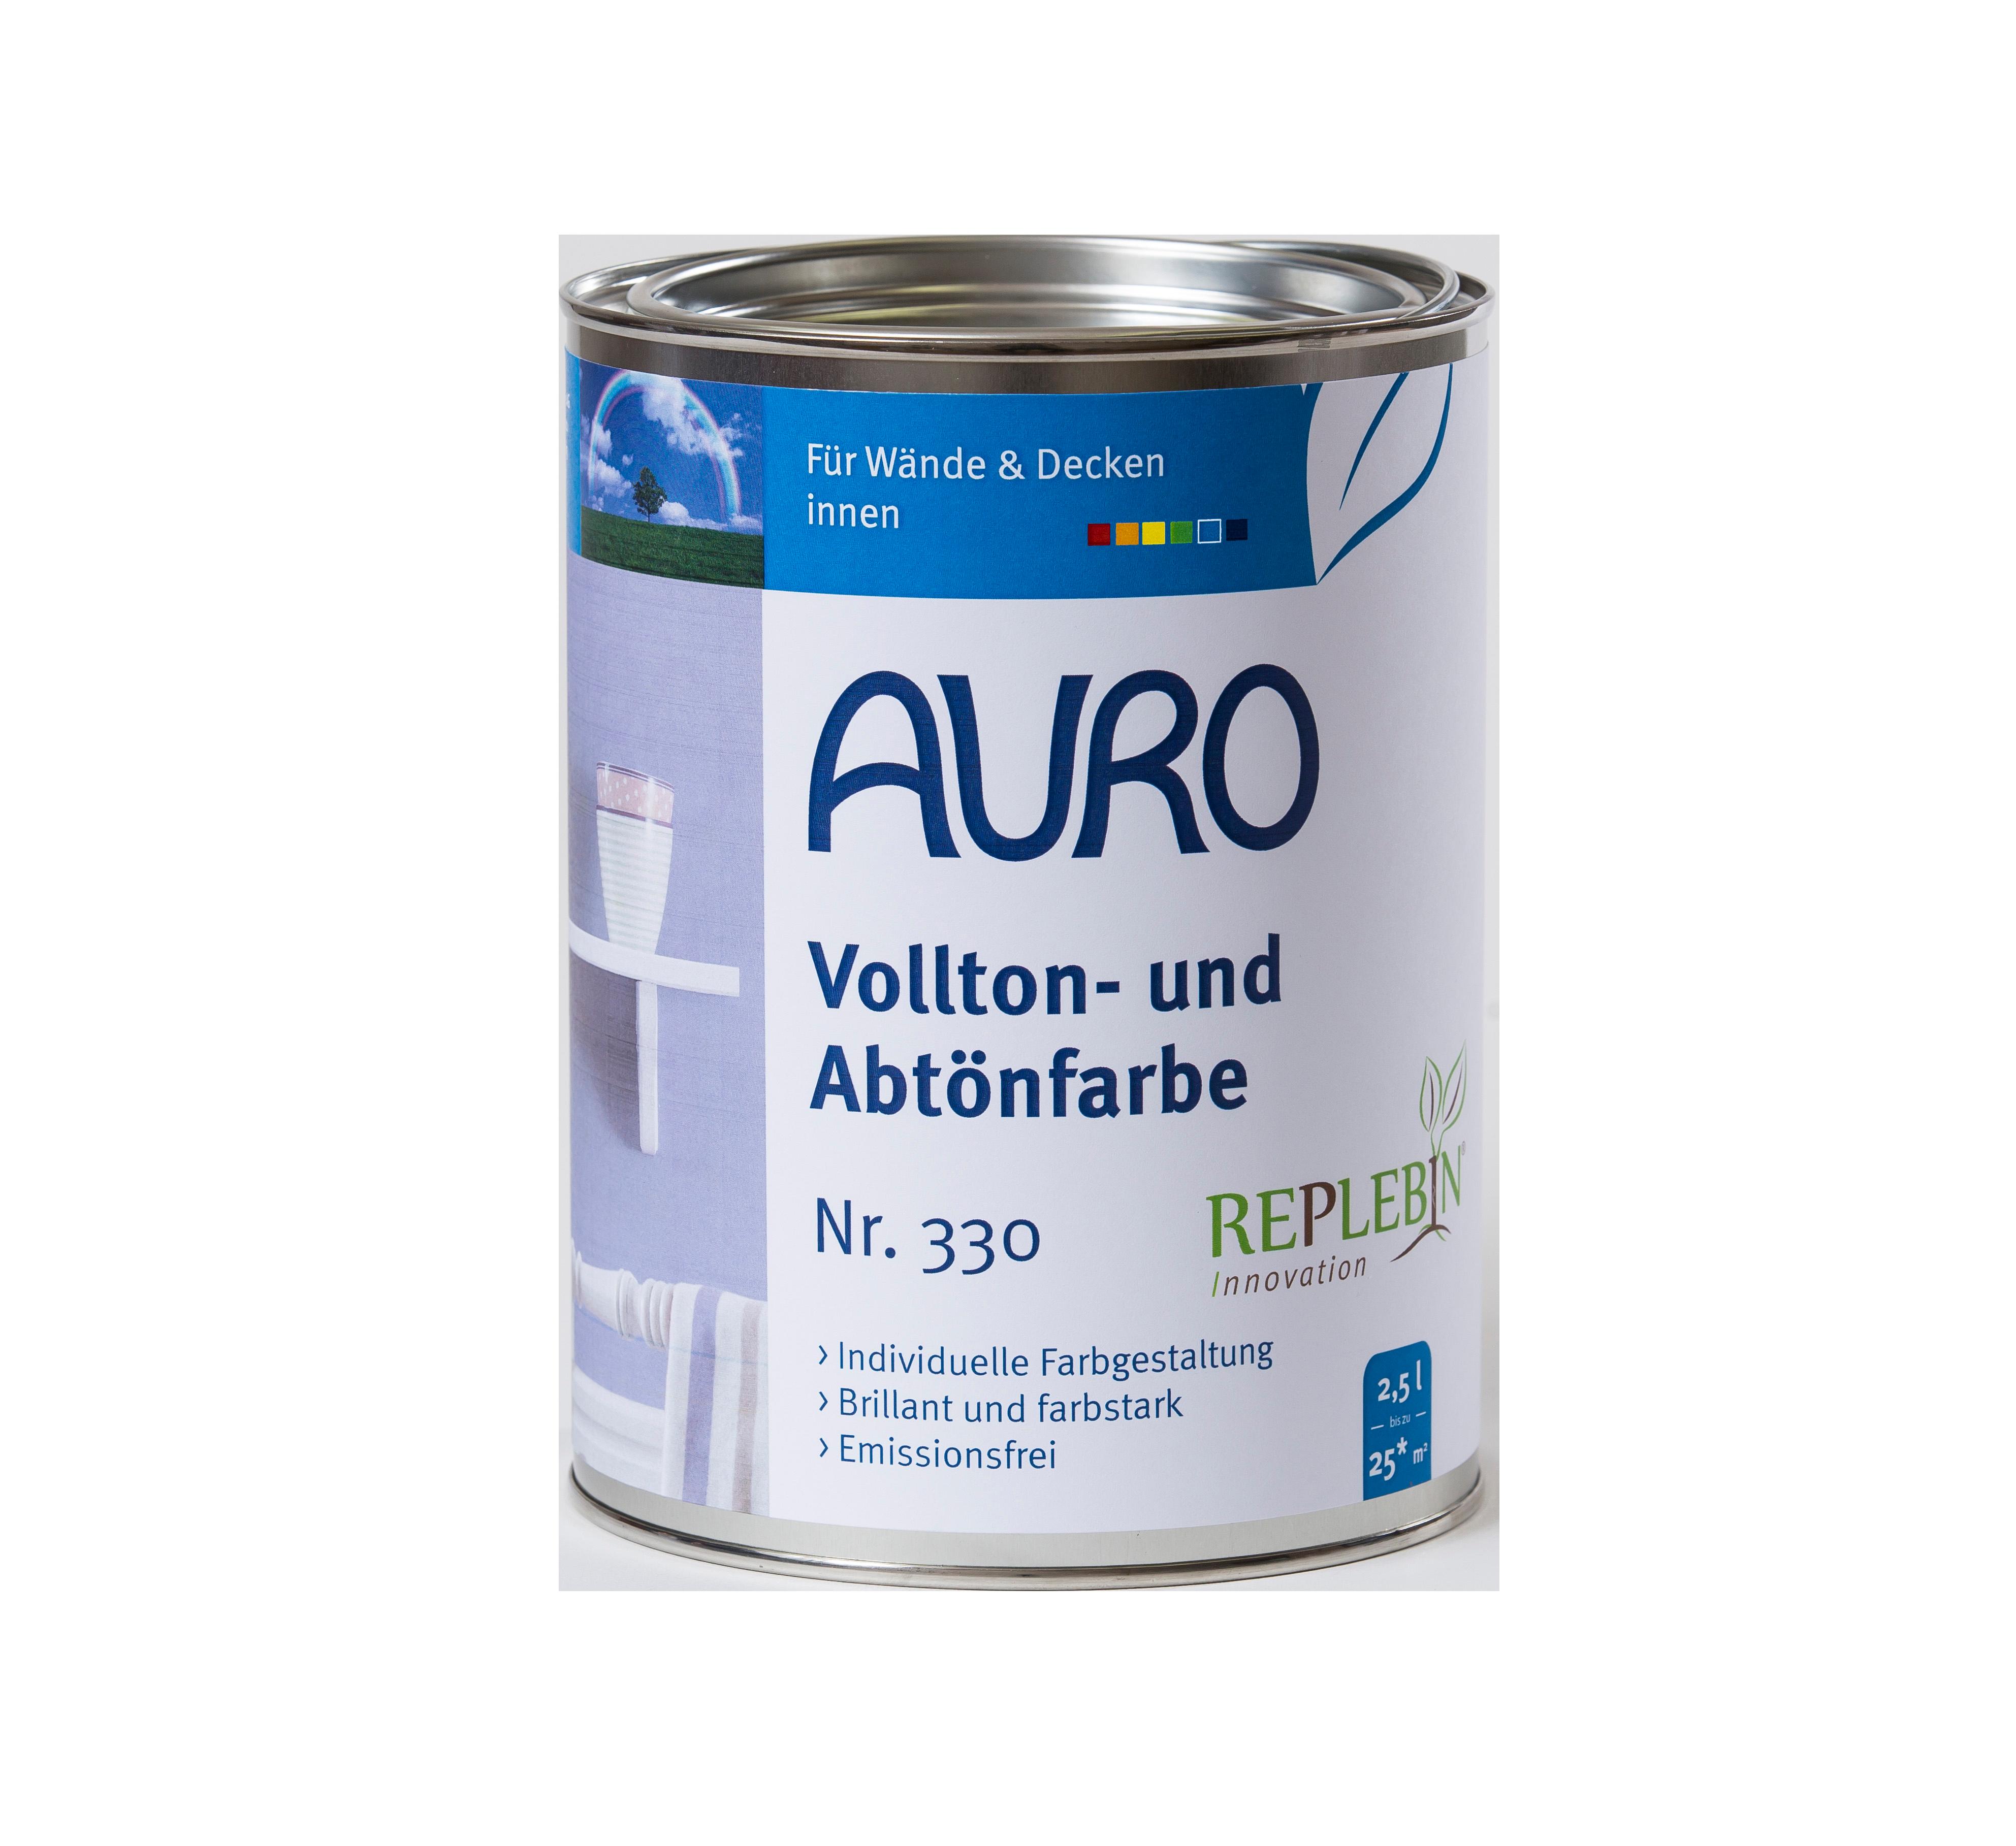 AURO Vollton- und Abtönfarbe Nr. 330 - 2,5 L